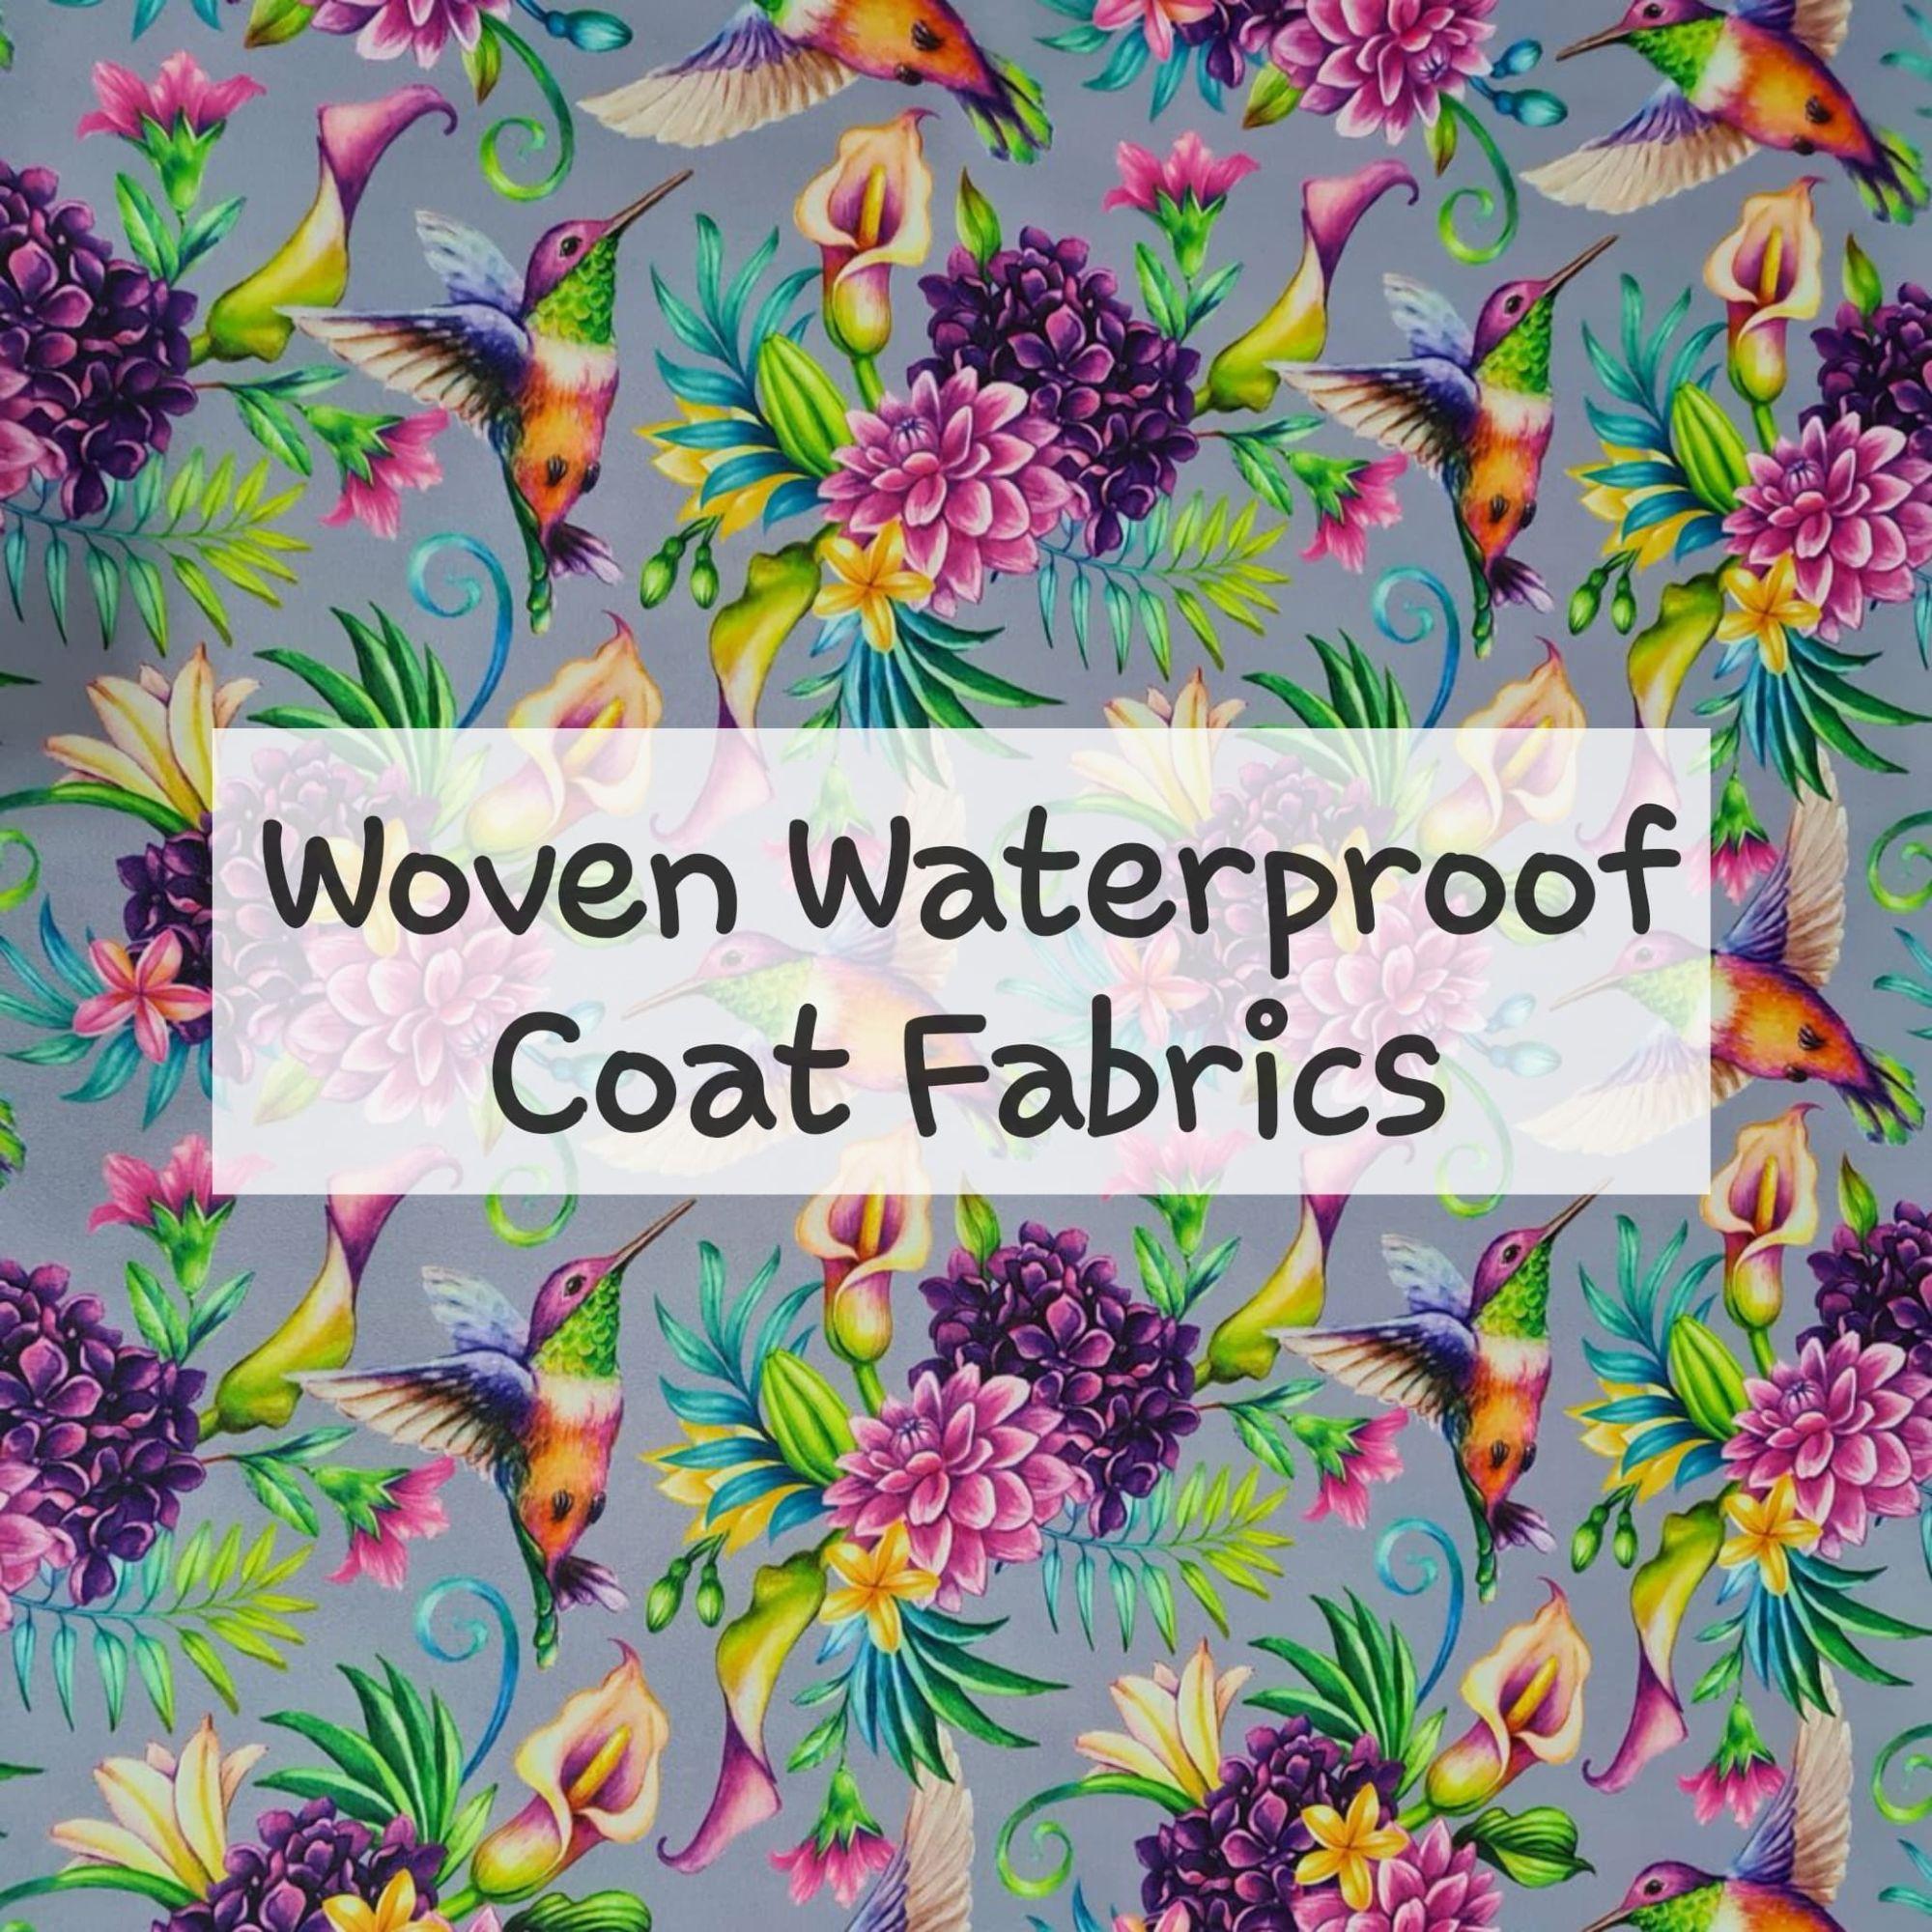 woven waterproof patterened coat fabrics